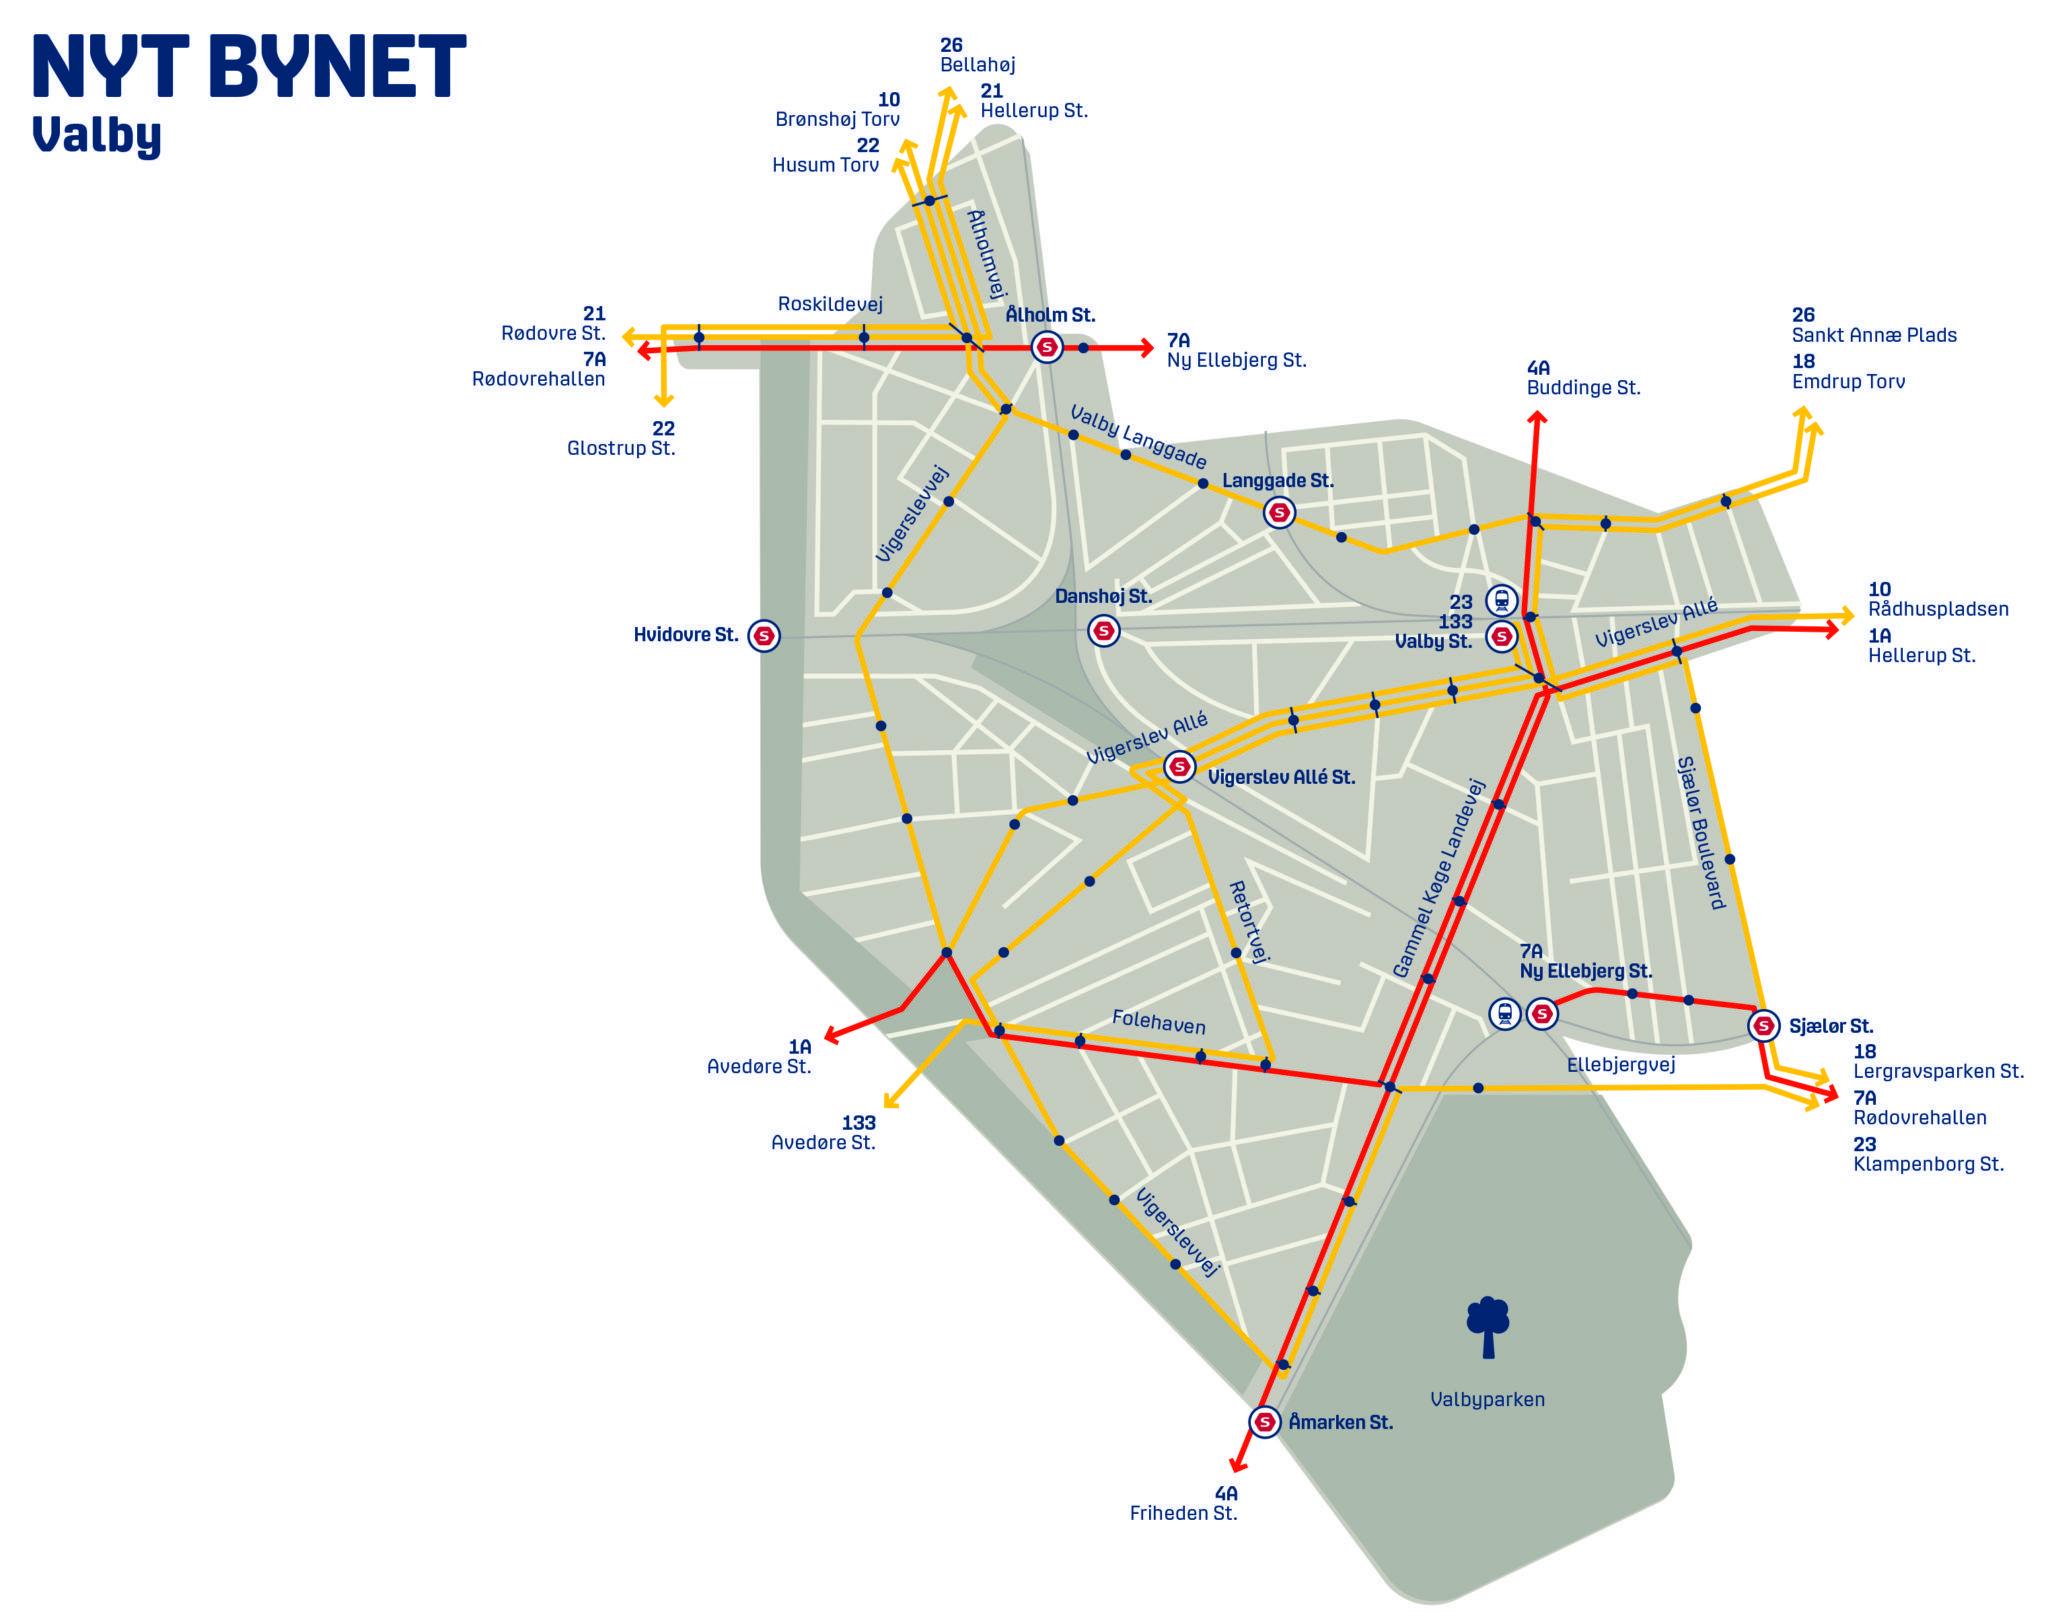 Nyt Bynet 2019 - Valby